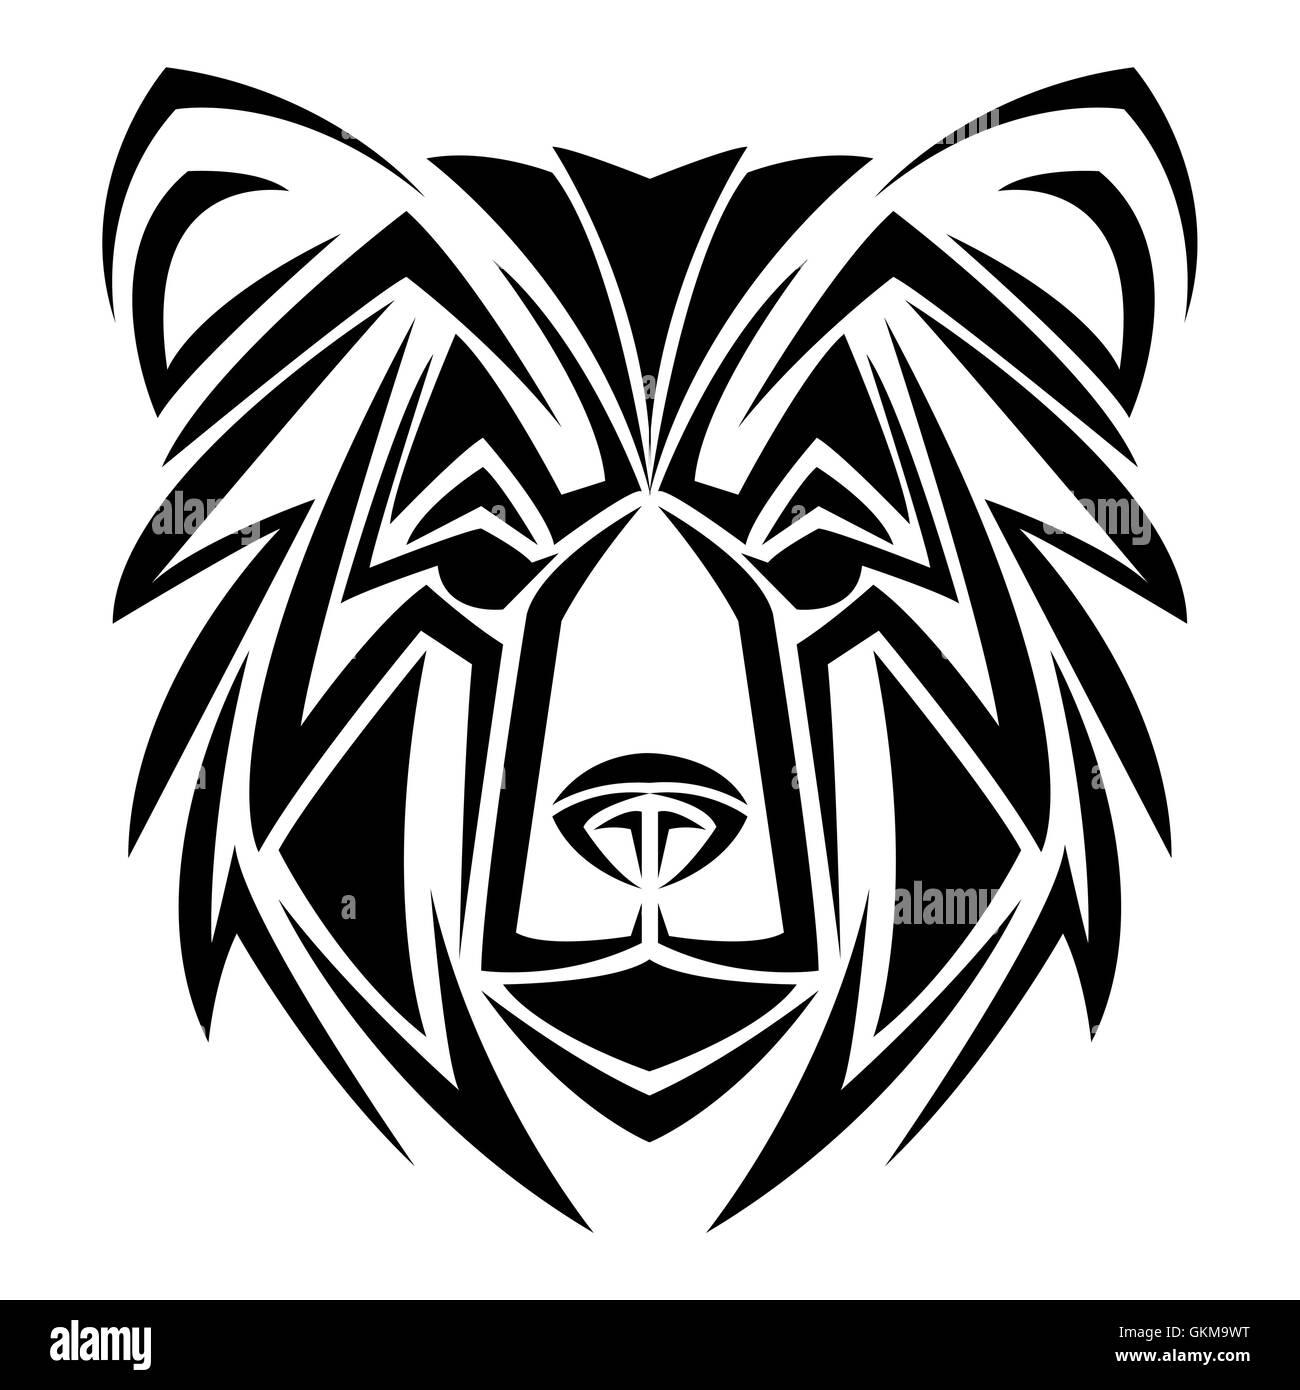 Bear Tattoo Animal Design Stock Vector Art Illustration Vector